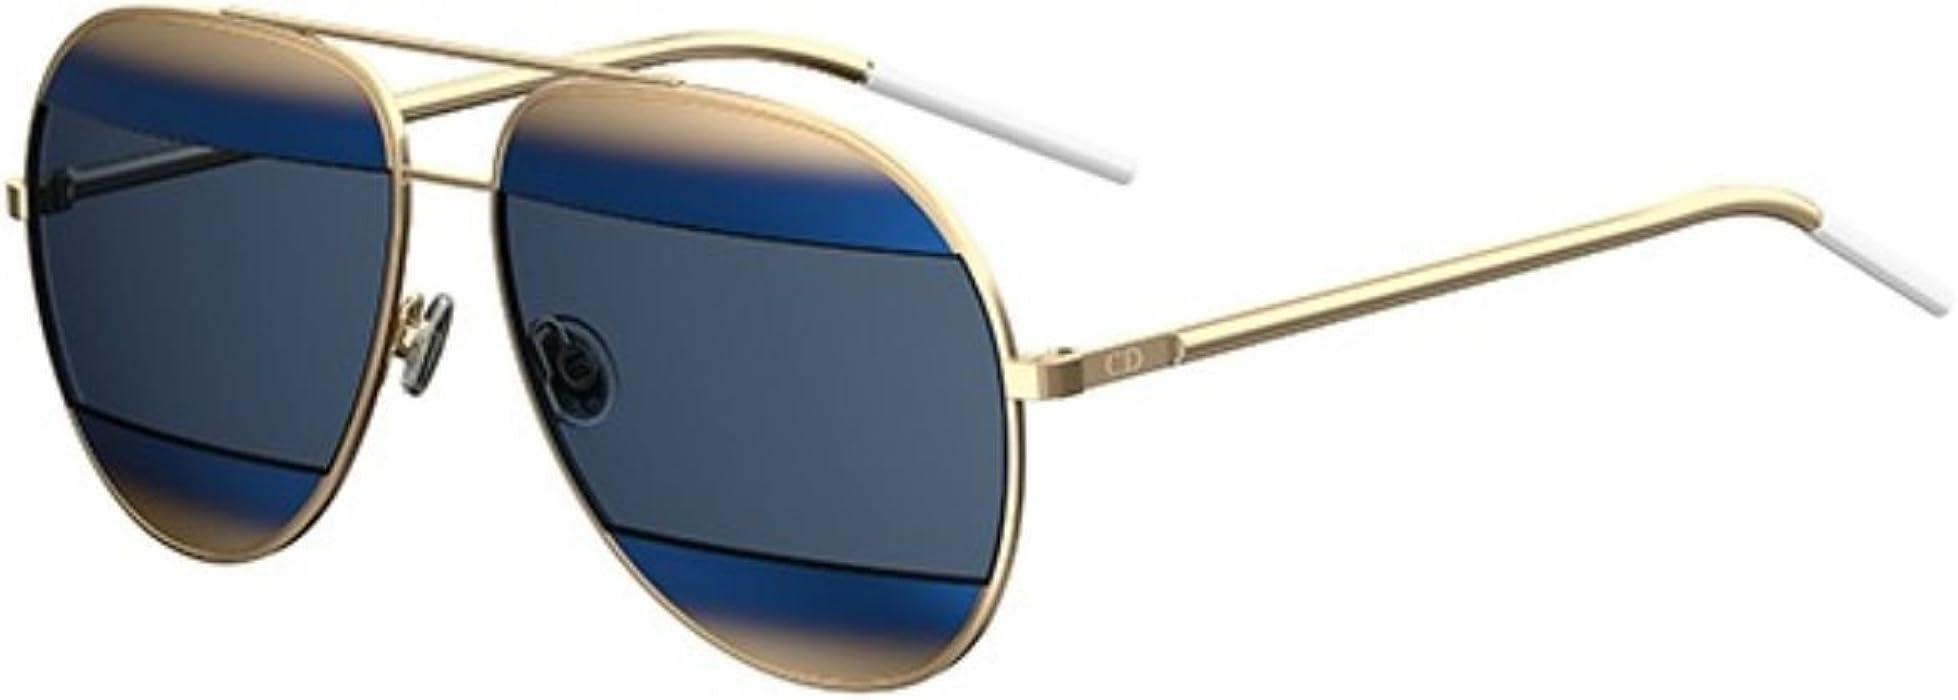 6f3c08c32cfc Amazon.com  Authentic Christian Dior SPLIT 1 2JY KU Gold Sunglasses ...